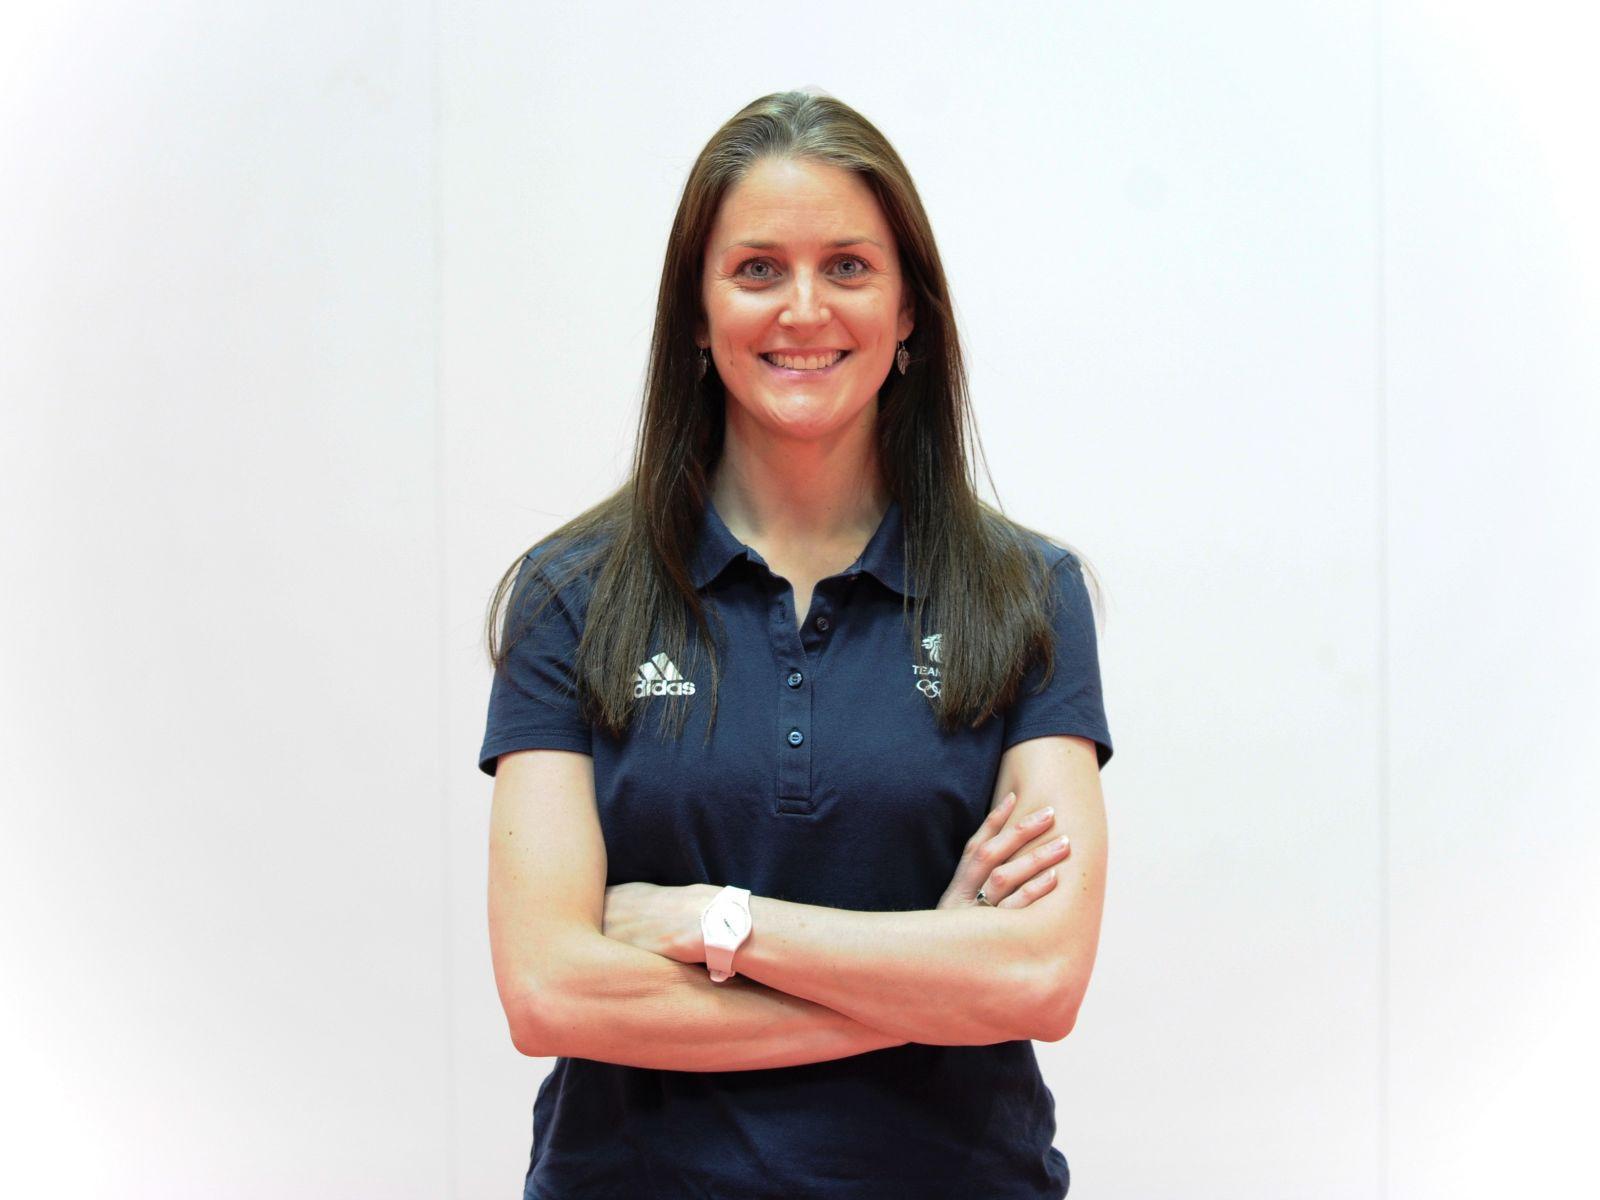 Elaine Skilton has been appointed as Britain's Chef de Mission for Vuokatti 2021 ©BOA